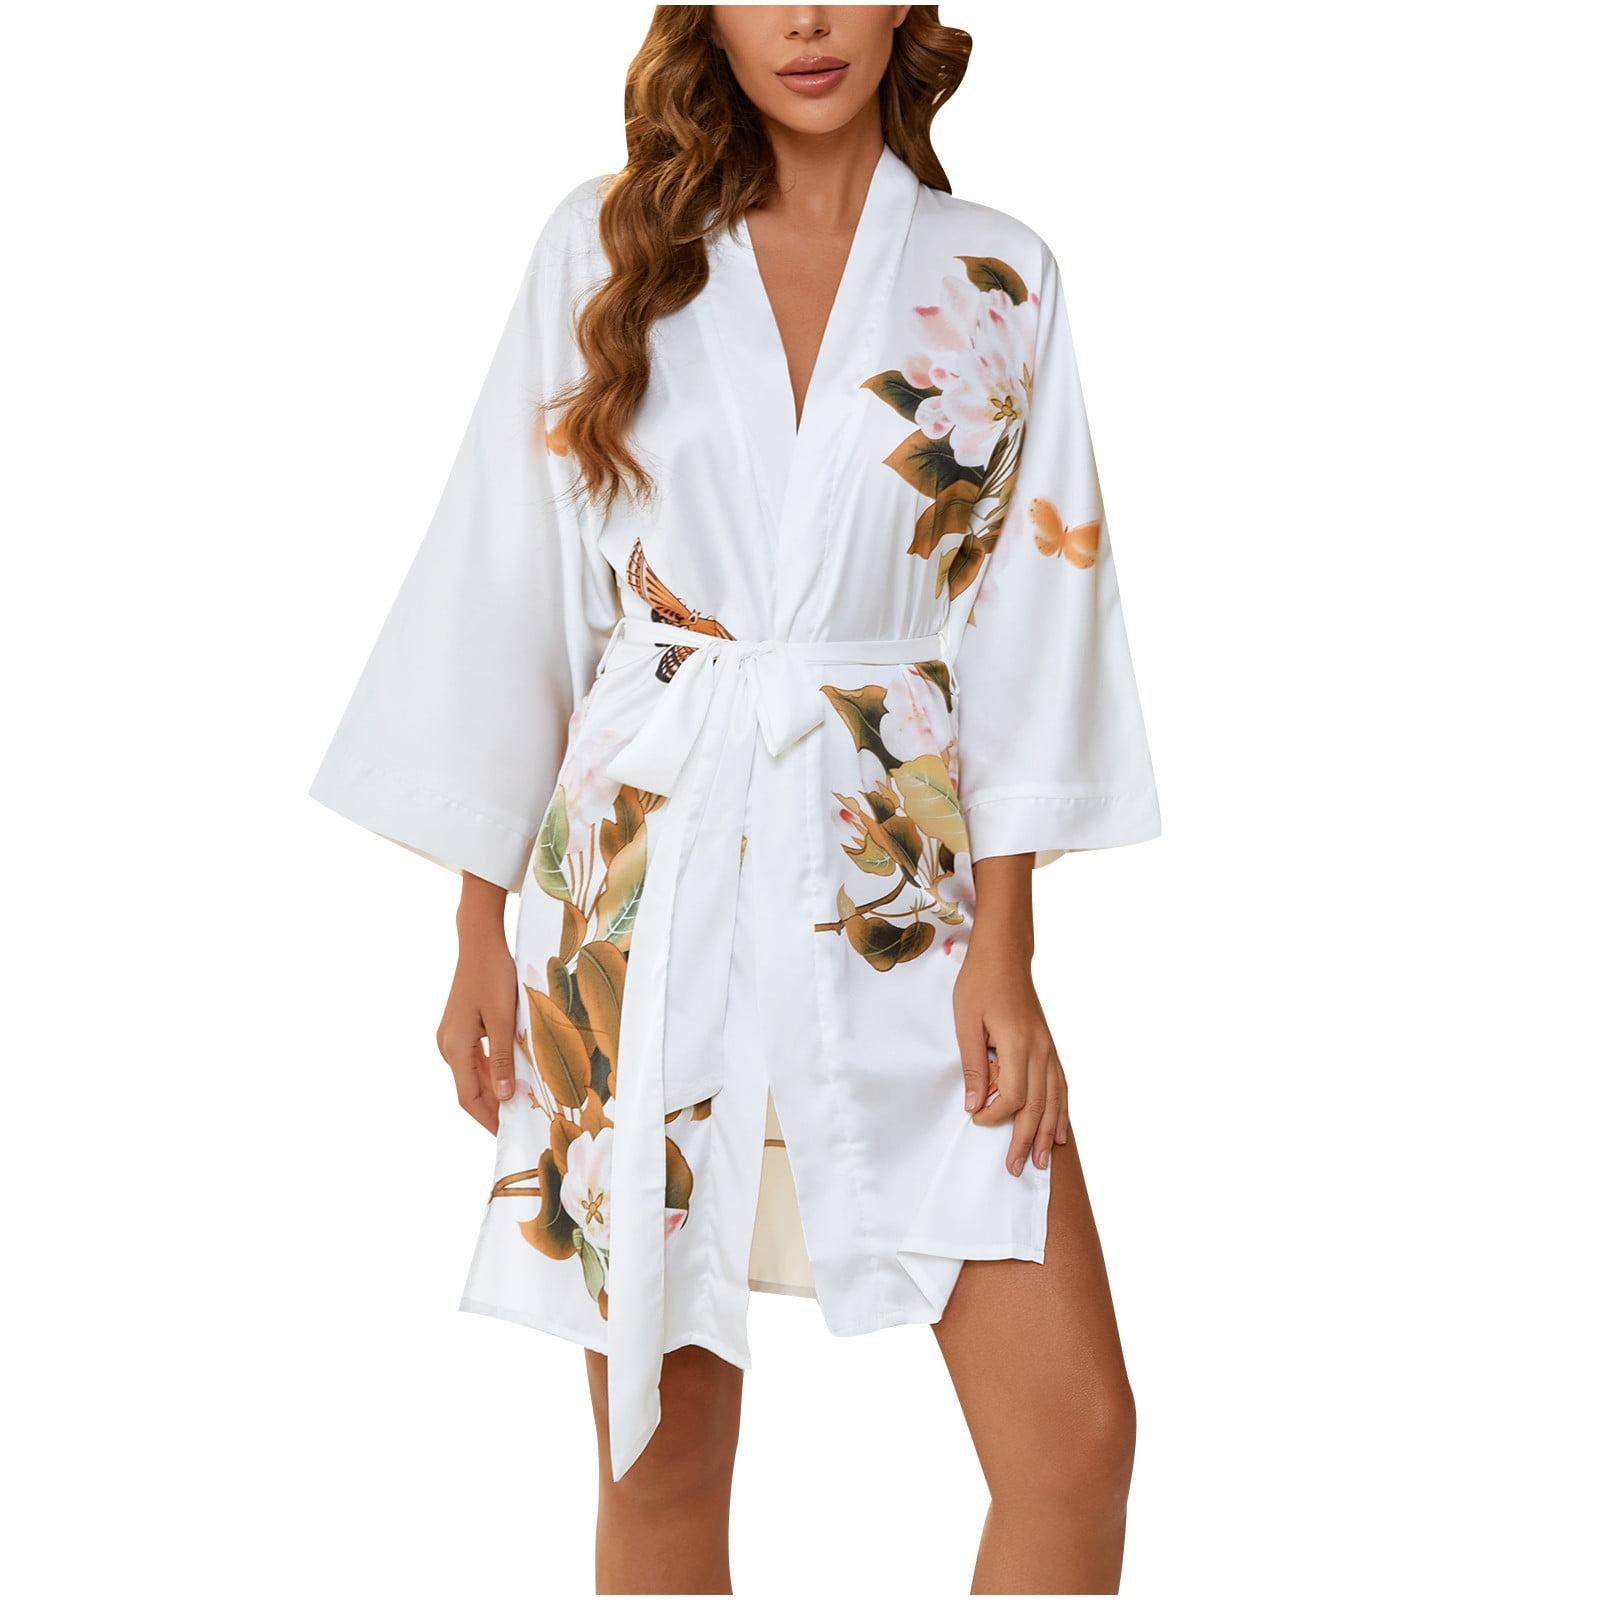 Details about  /Womens Boho Floral Printed Long Cardigan Sleep Robe Night Dress Shirts Sleepwear